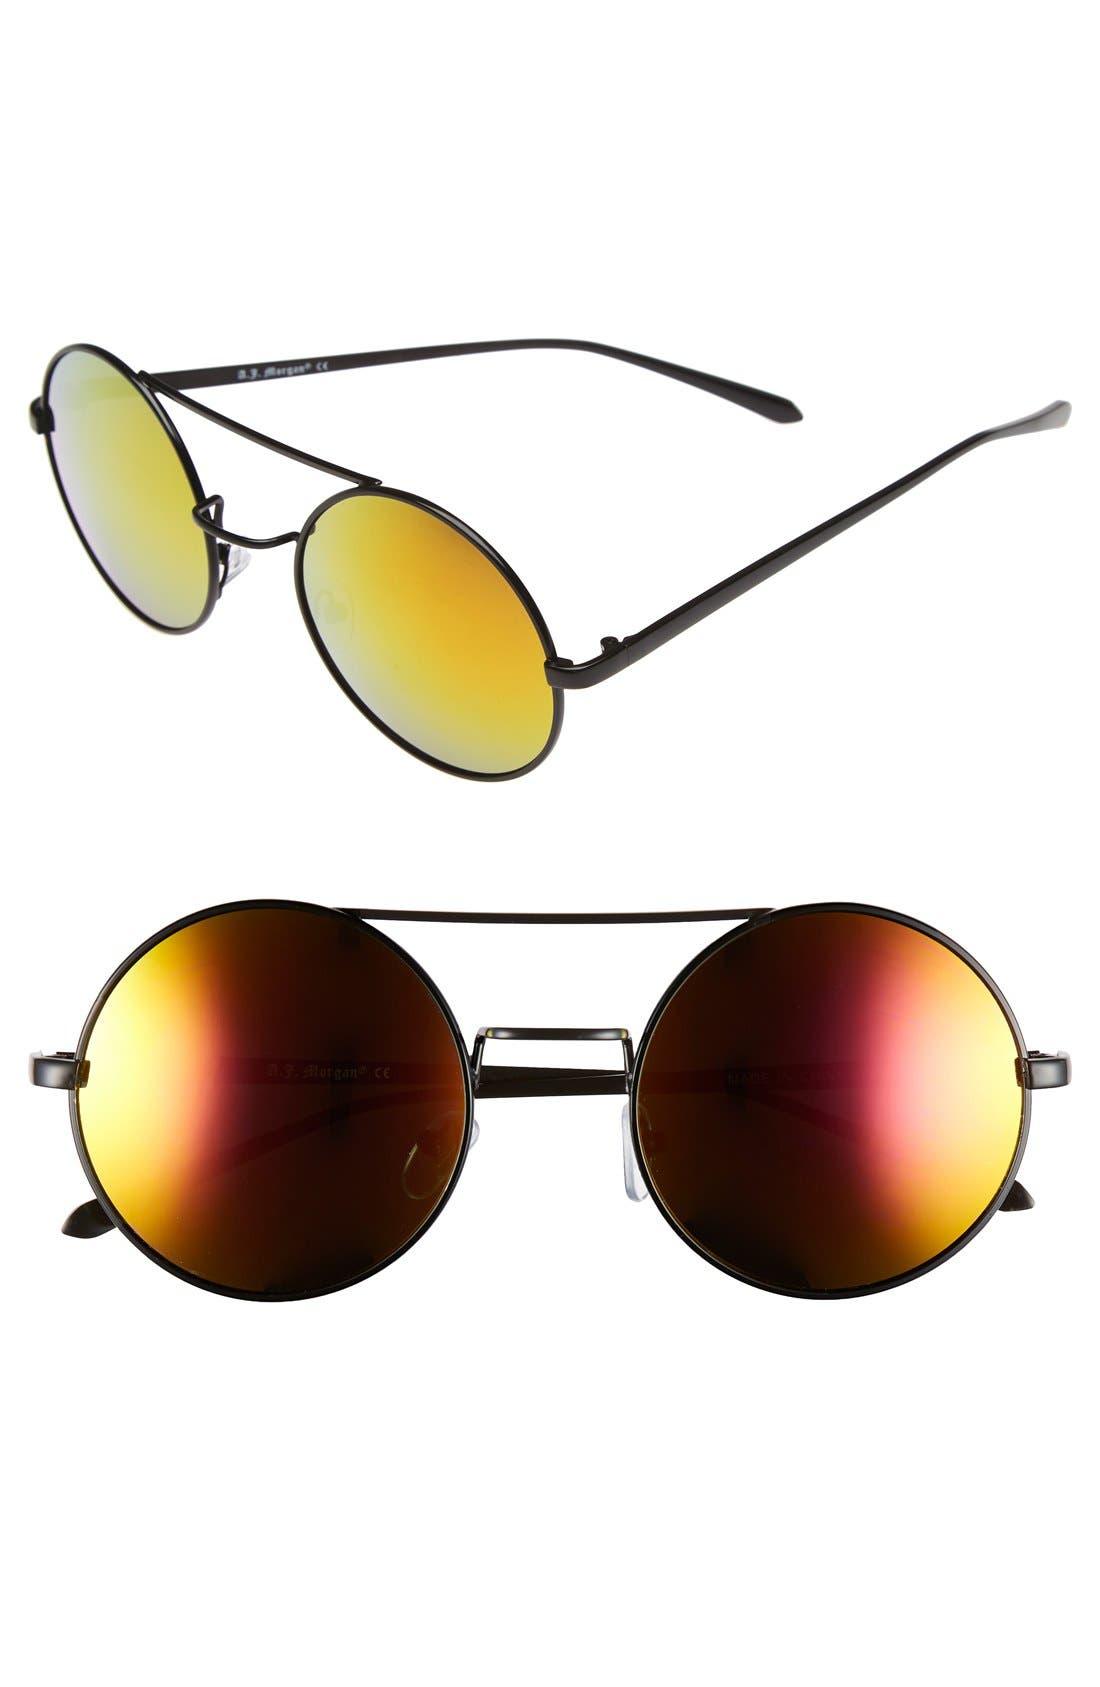 A.J. MORGAN 'Eclipse' 54mm Round Mirror Lens Sunglasses, Main, color, 001